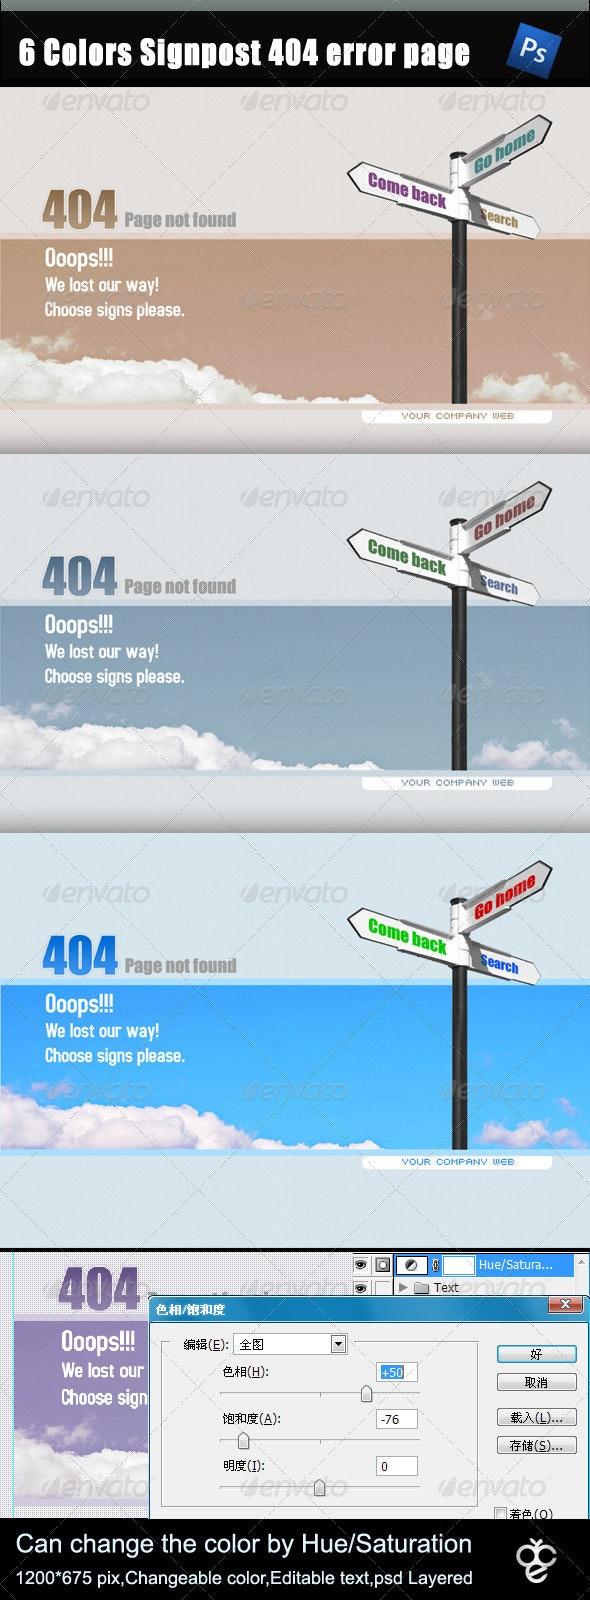 6 Colors Signpost 404 error page